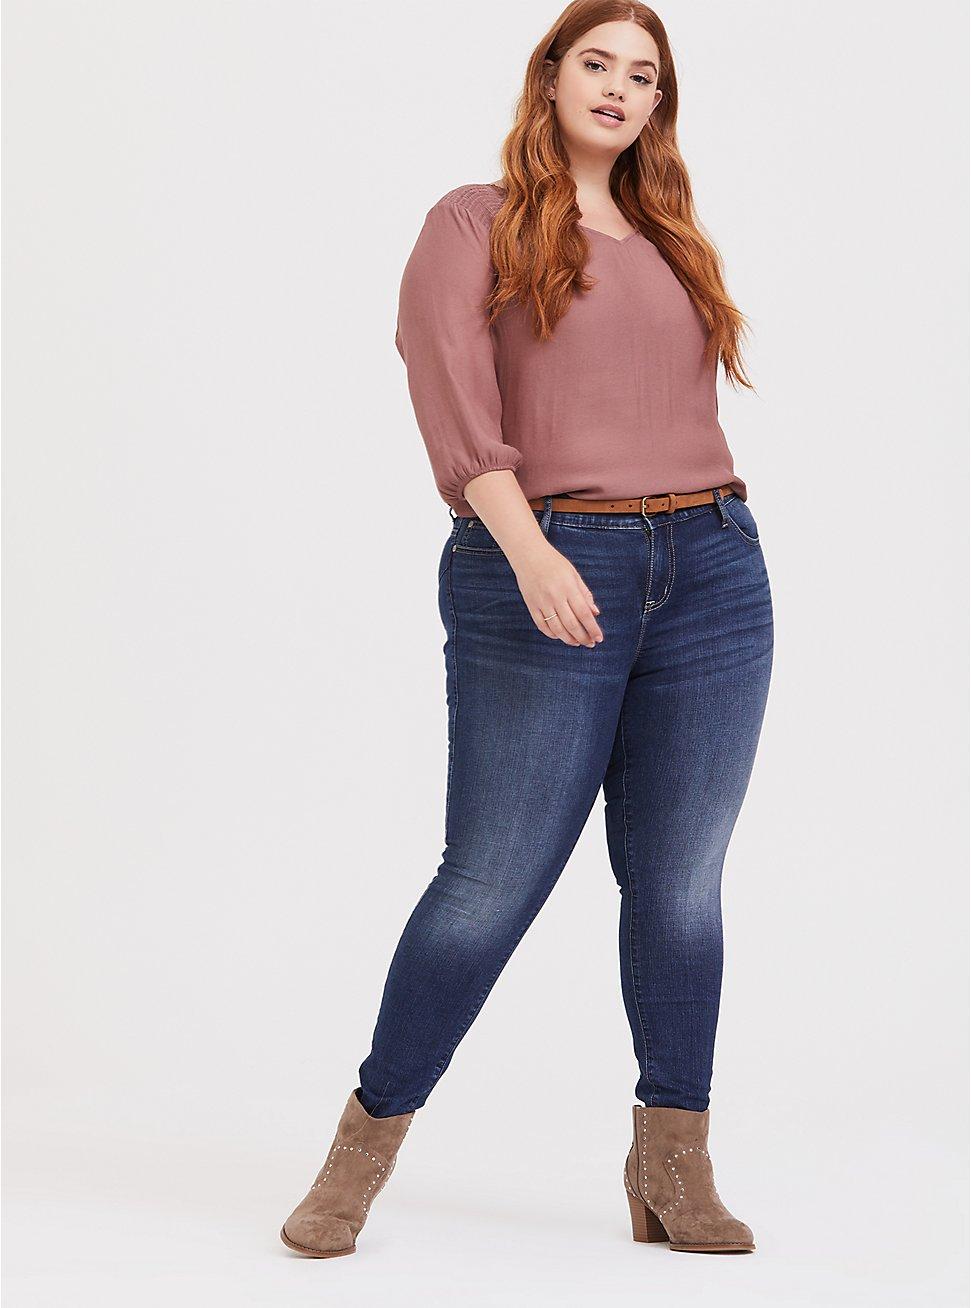 Bombshell Skinny Jean - Vintage Stretch Medium Wash, BACK COUNTRY, hi-res